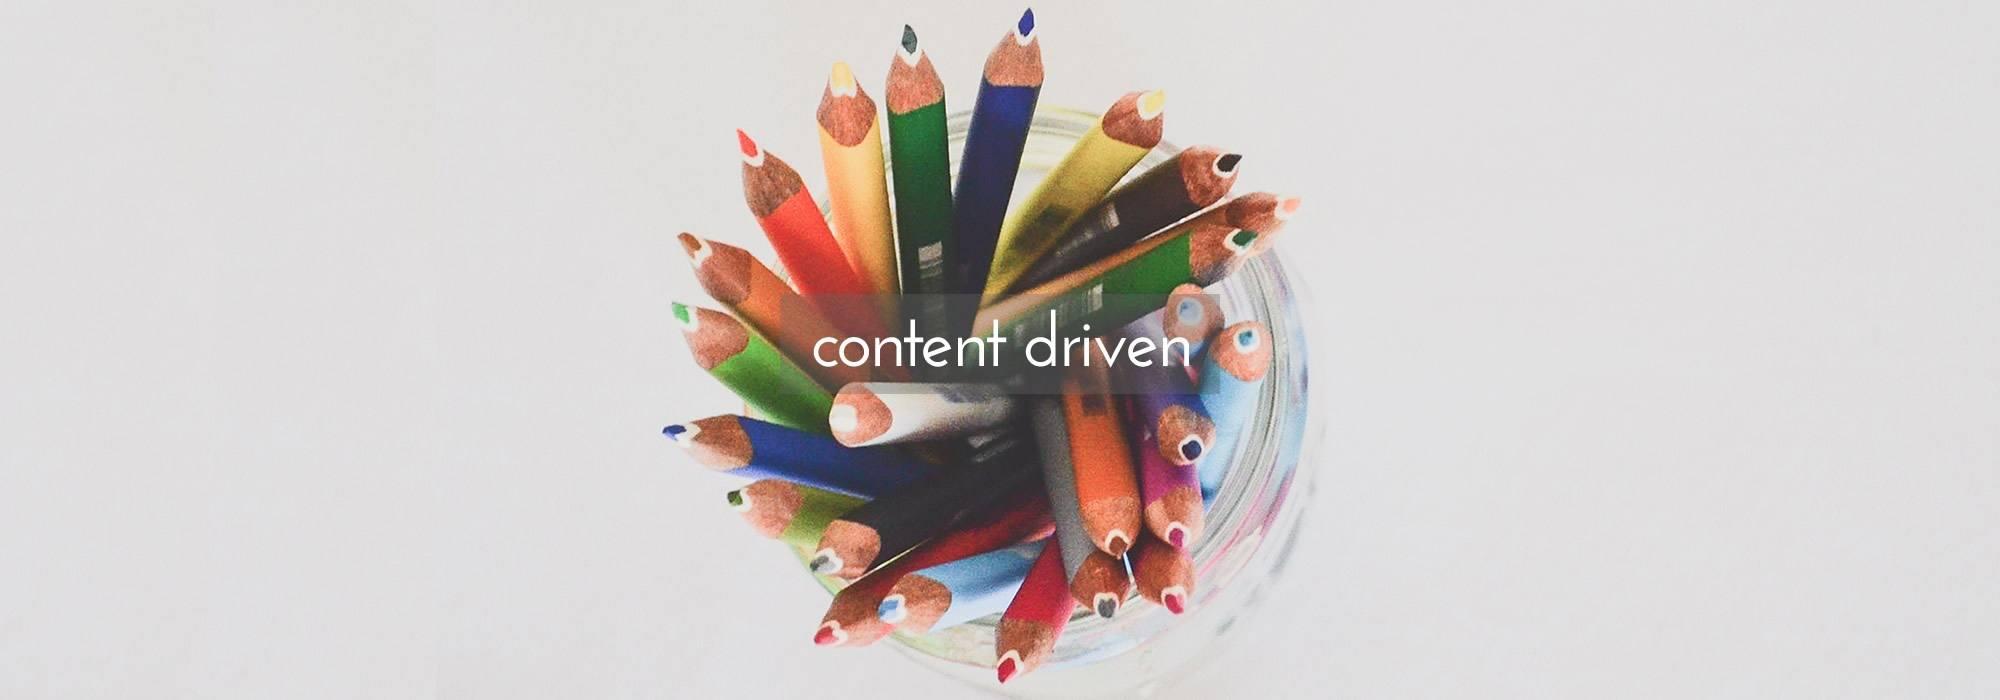 Content driven website